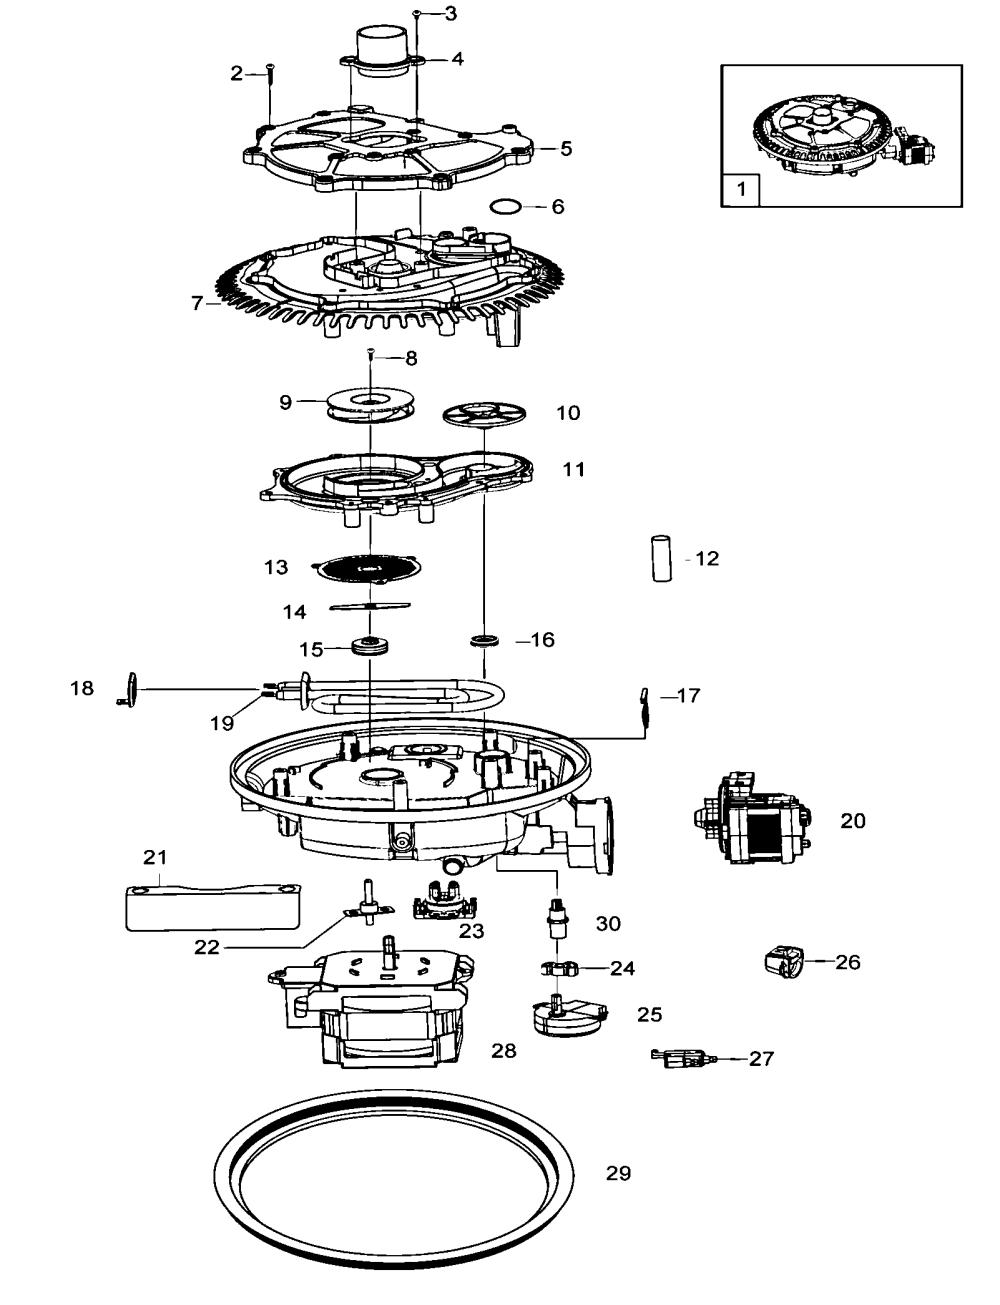 medium resolution of samsung dmt800rhs xaa pump assy diagram